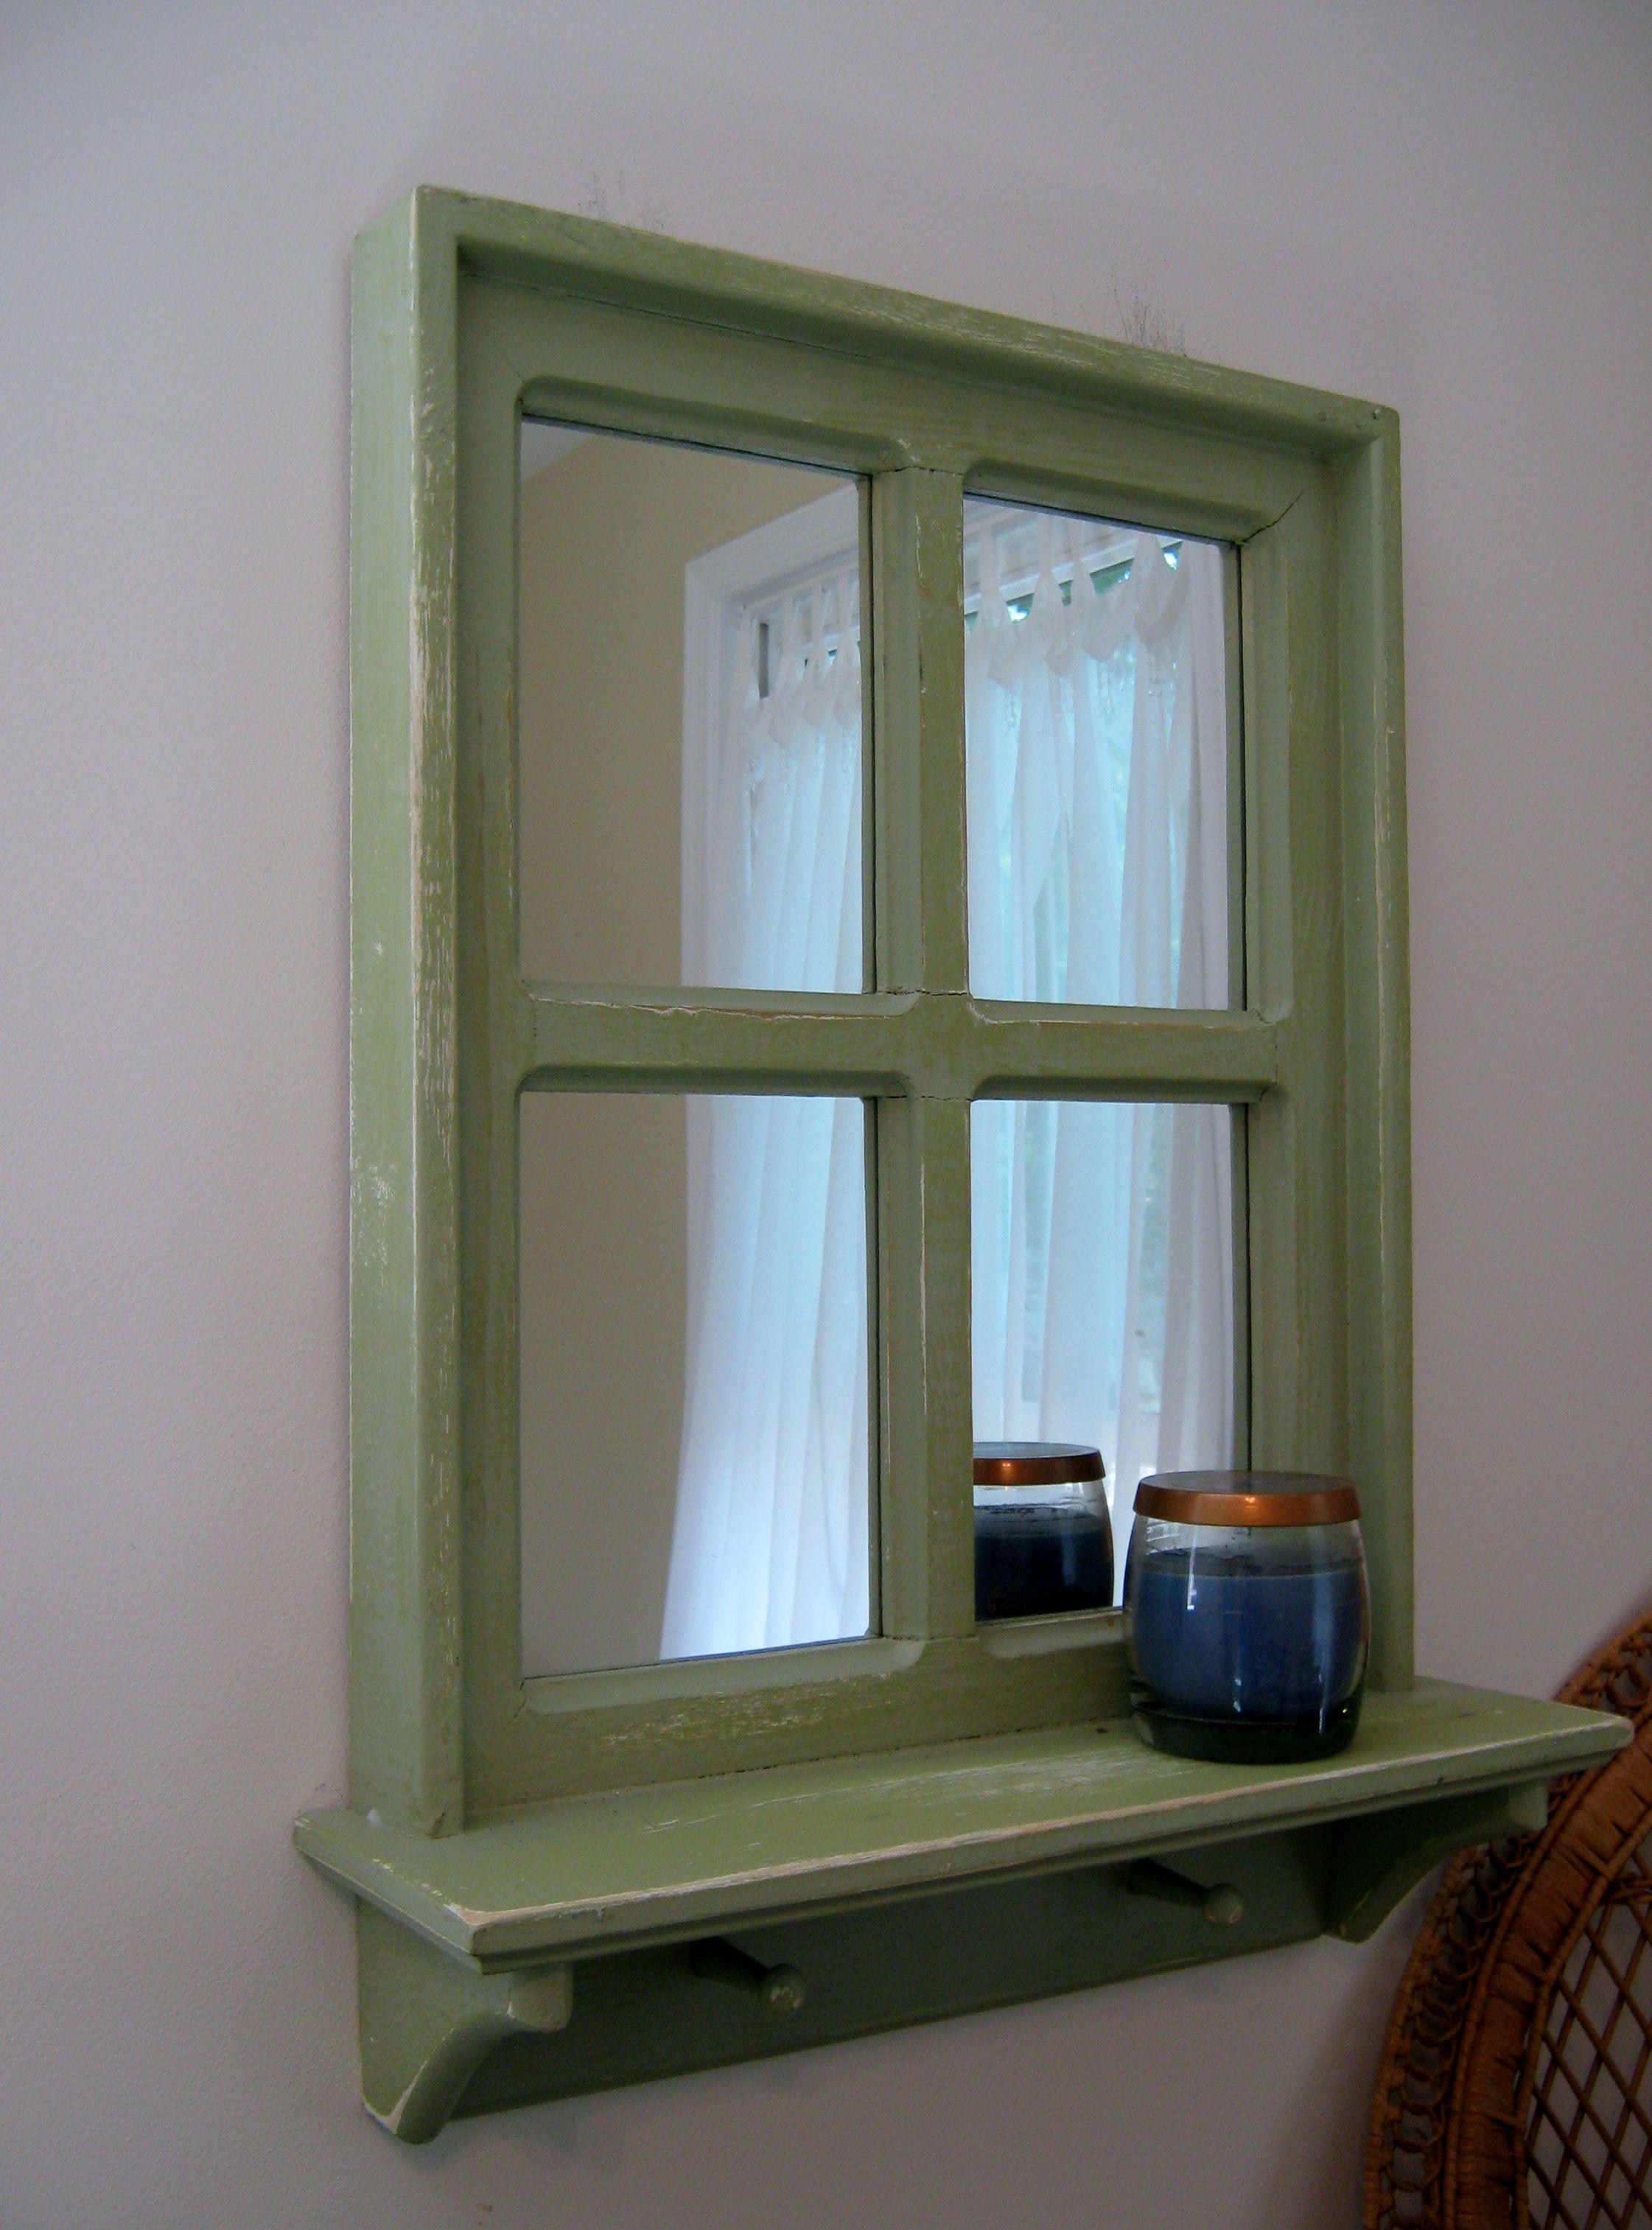 20 Quot X 26 Quot Window Frame Mirror Pine Terrace Treasures